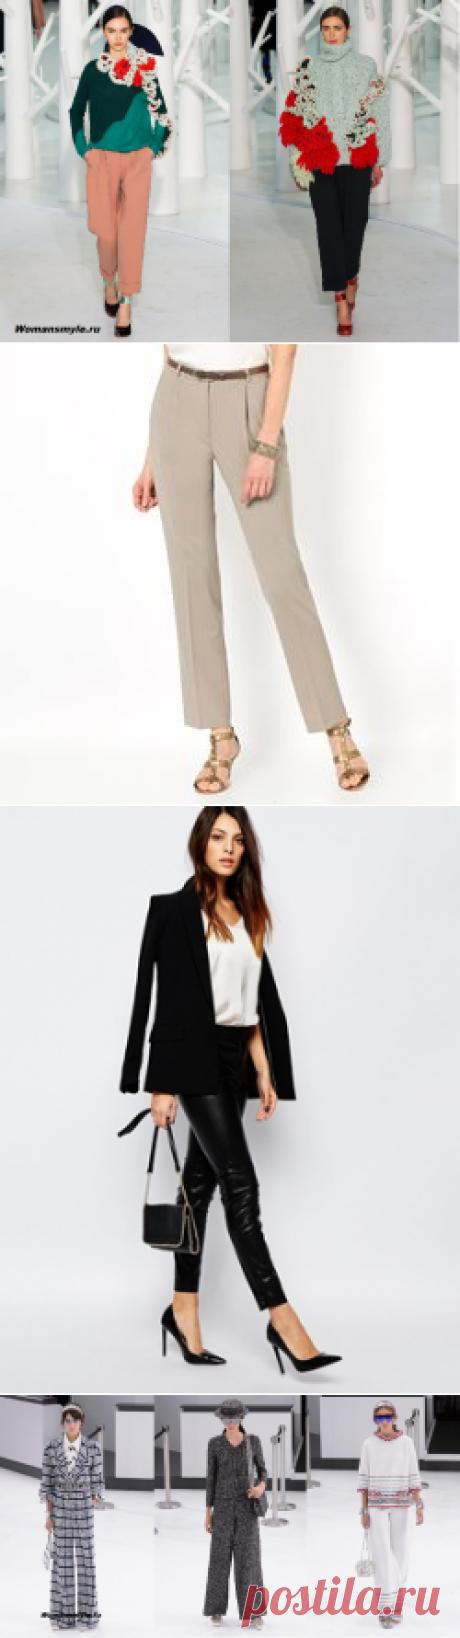 Какими будут модные брюки 2016 года